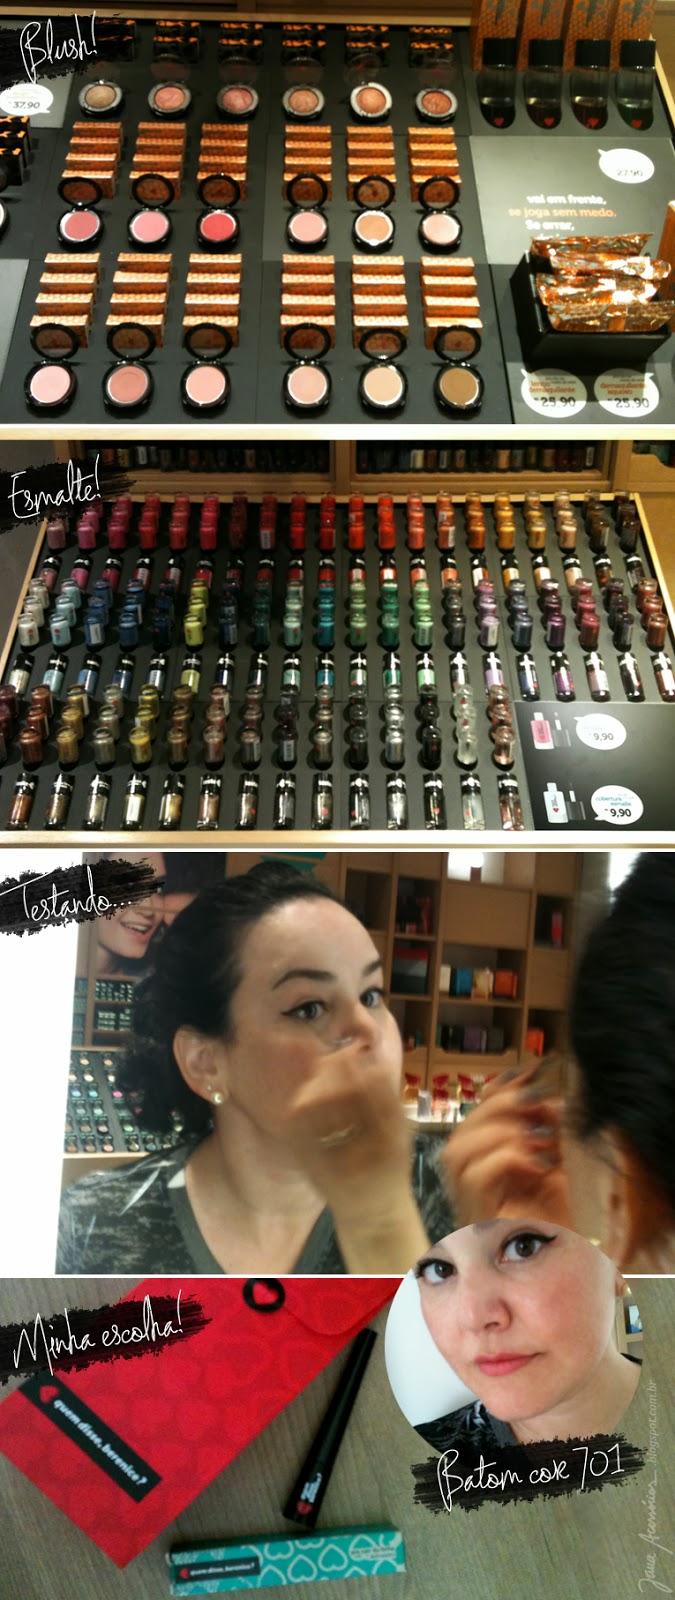 Joinville, Blog da Jana, Jana Acessórios, Blogueira, Make up, Maquiagem